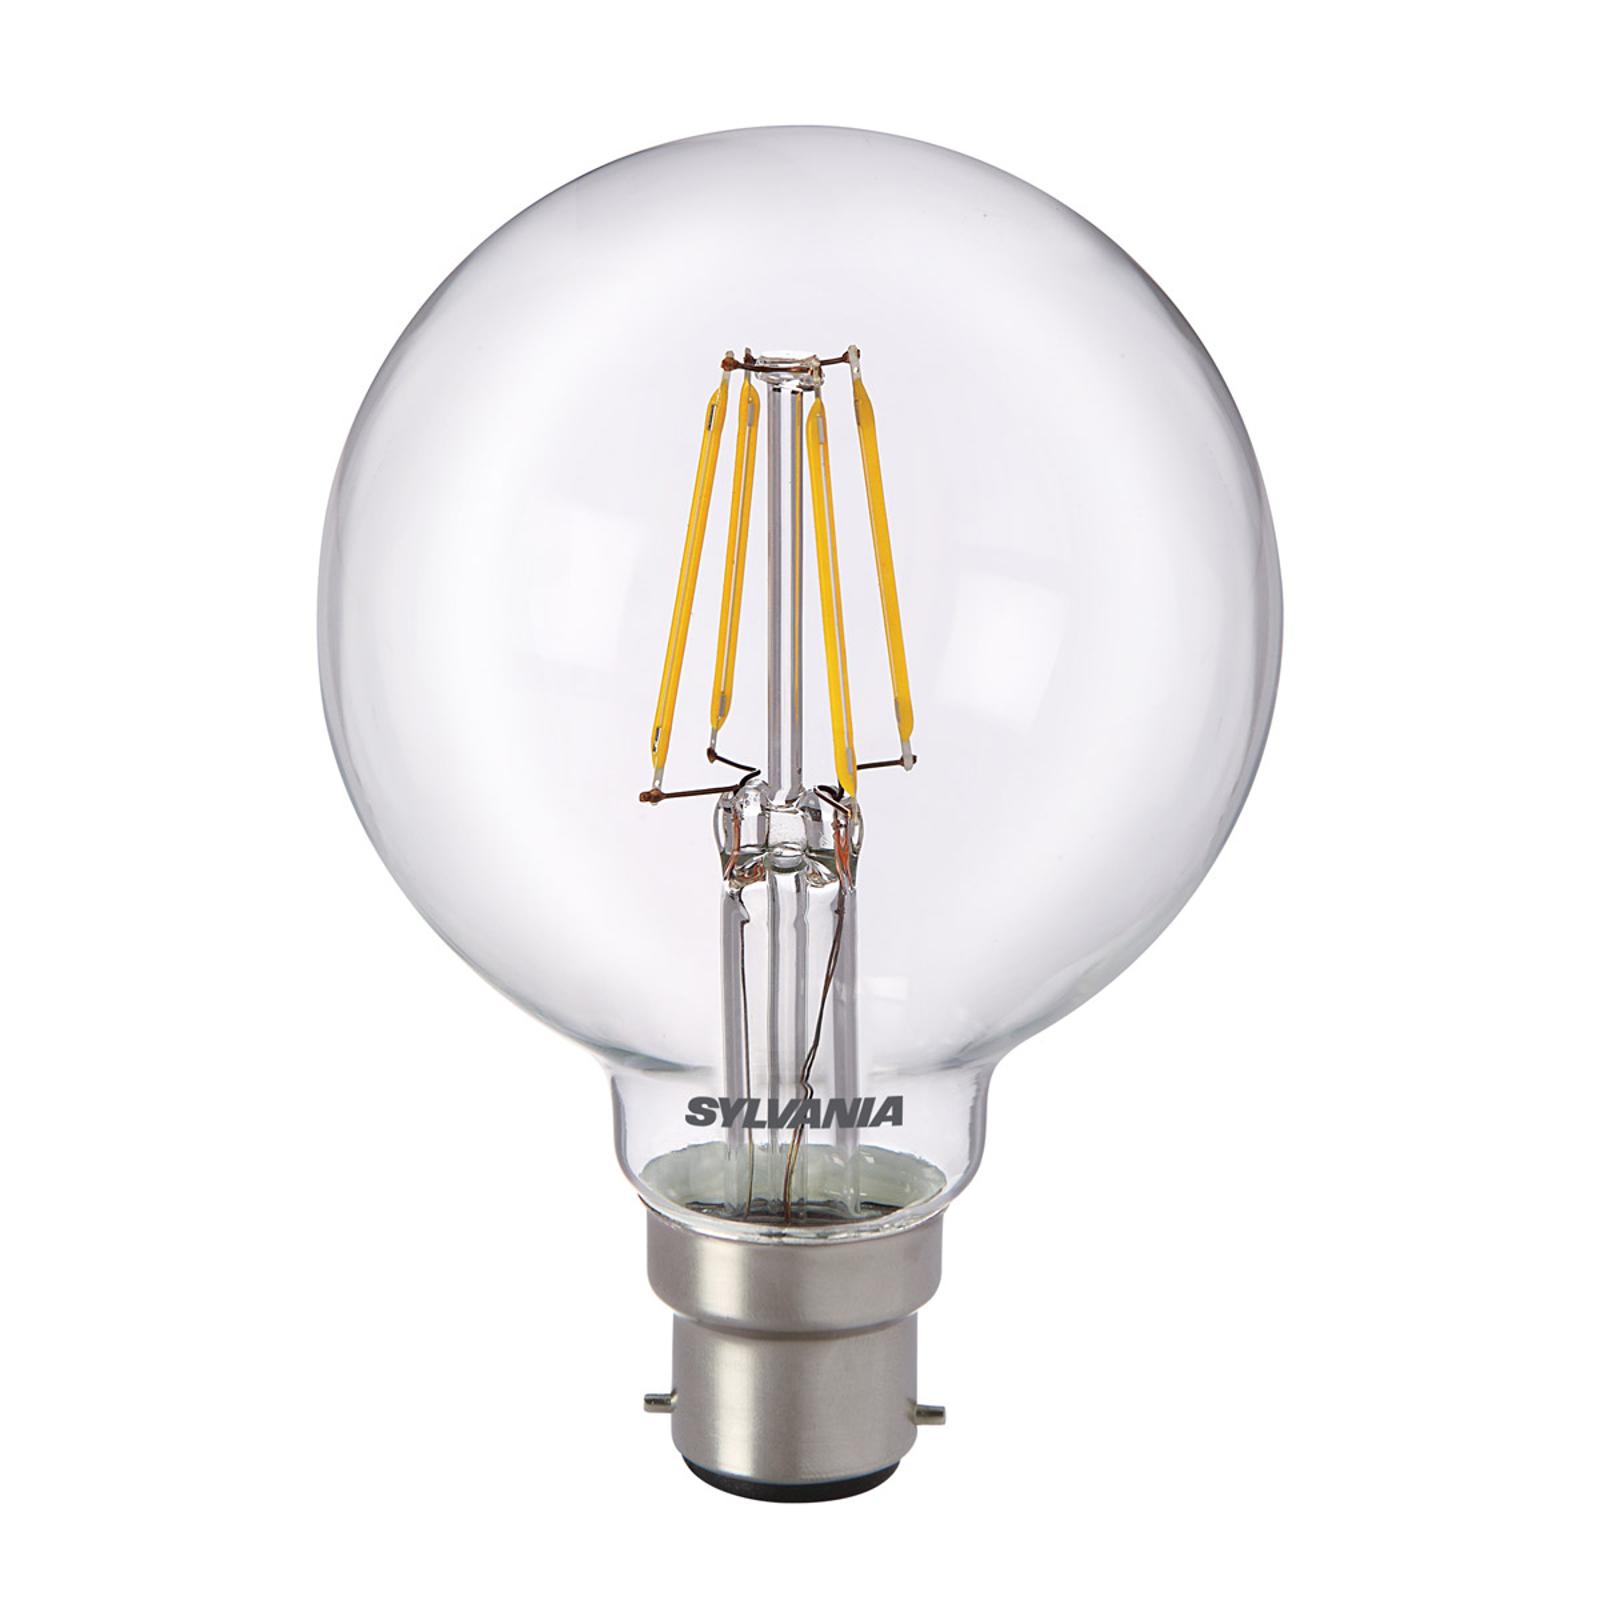 Acquista Lampadina LED a globo 827 B22 5W chiara